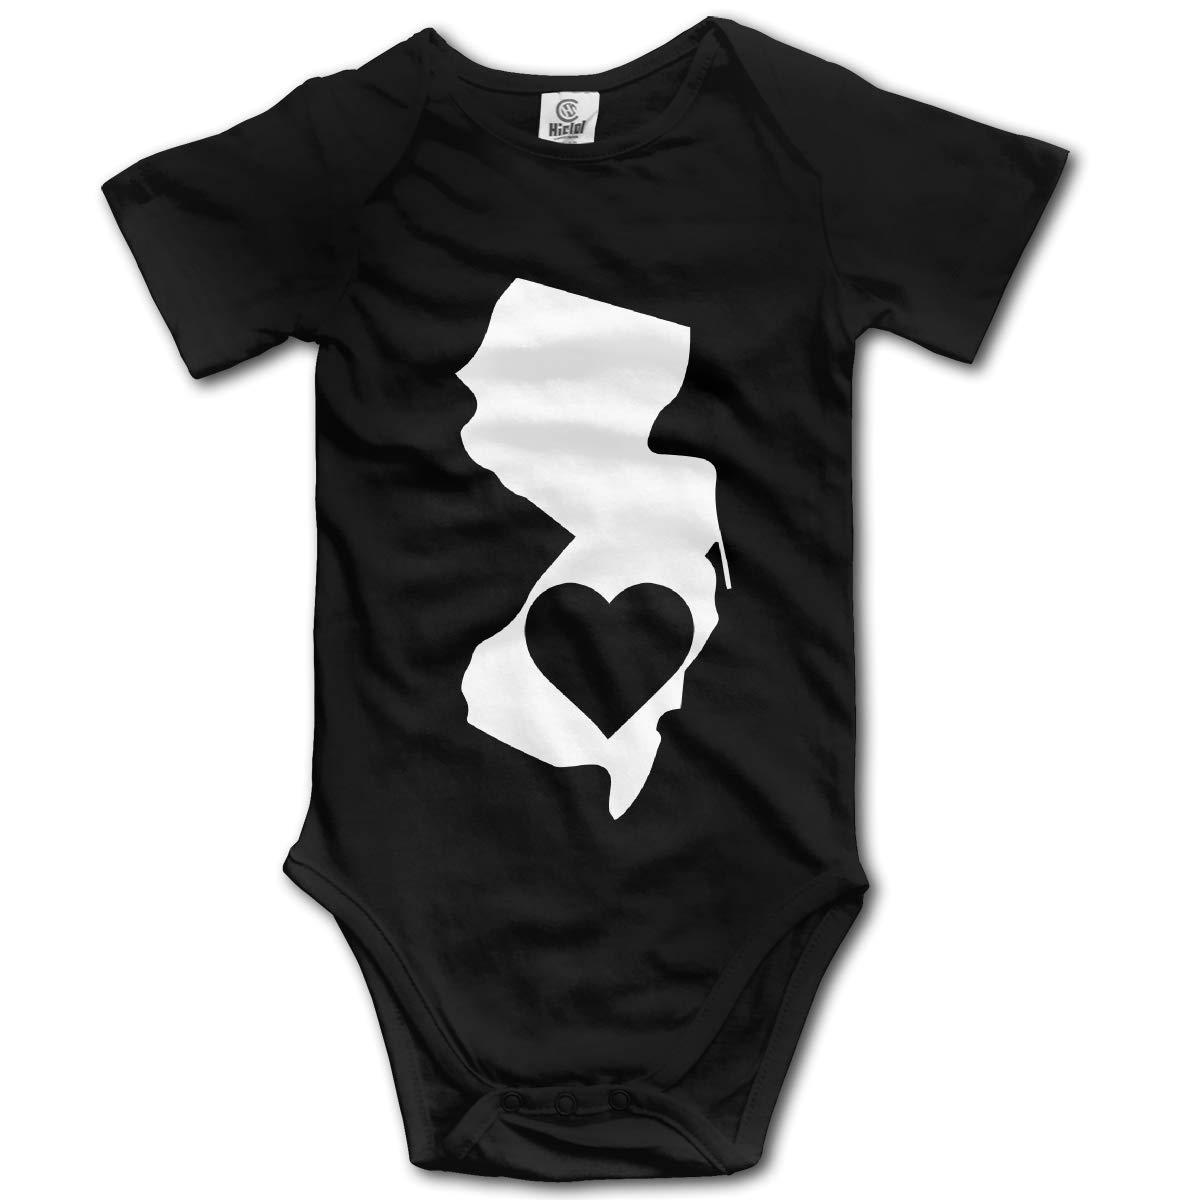 New Jersey Heart State Newborn Infant Baby 100/% Organic Cotton Layette Bodysuit 0-24 Months